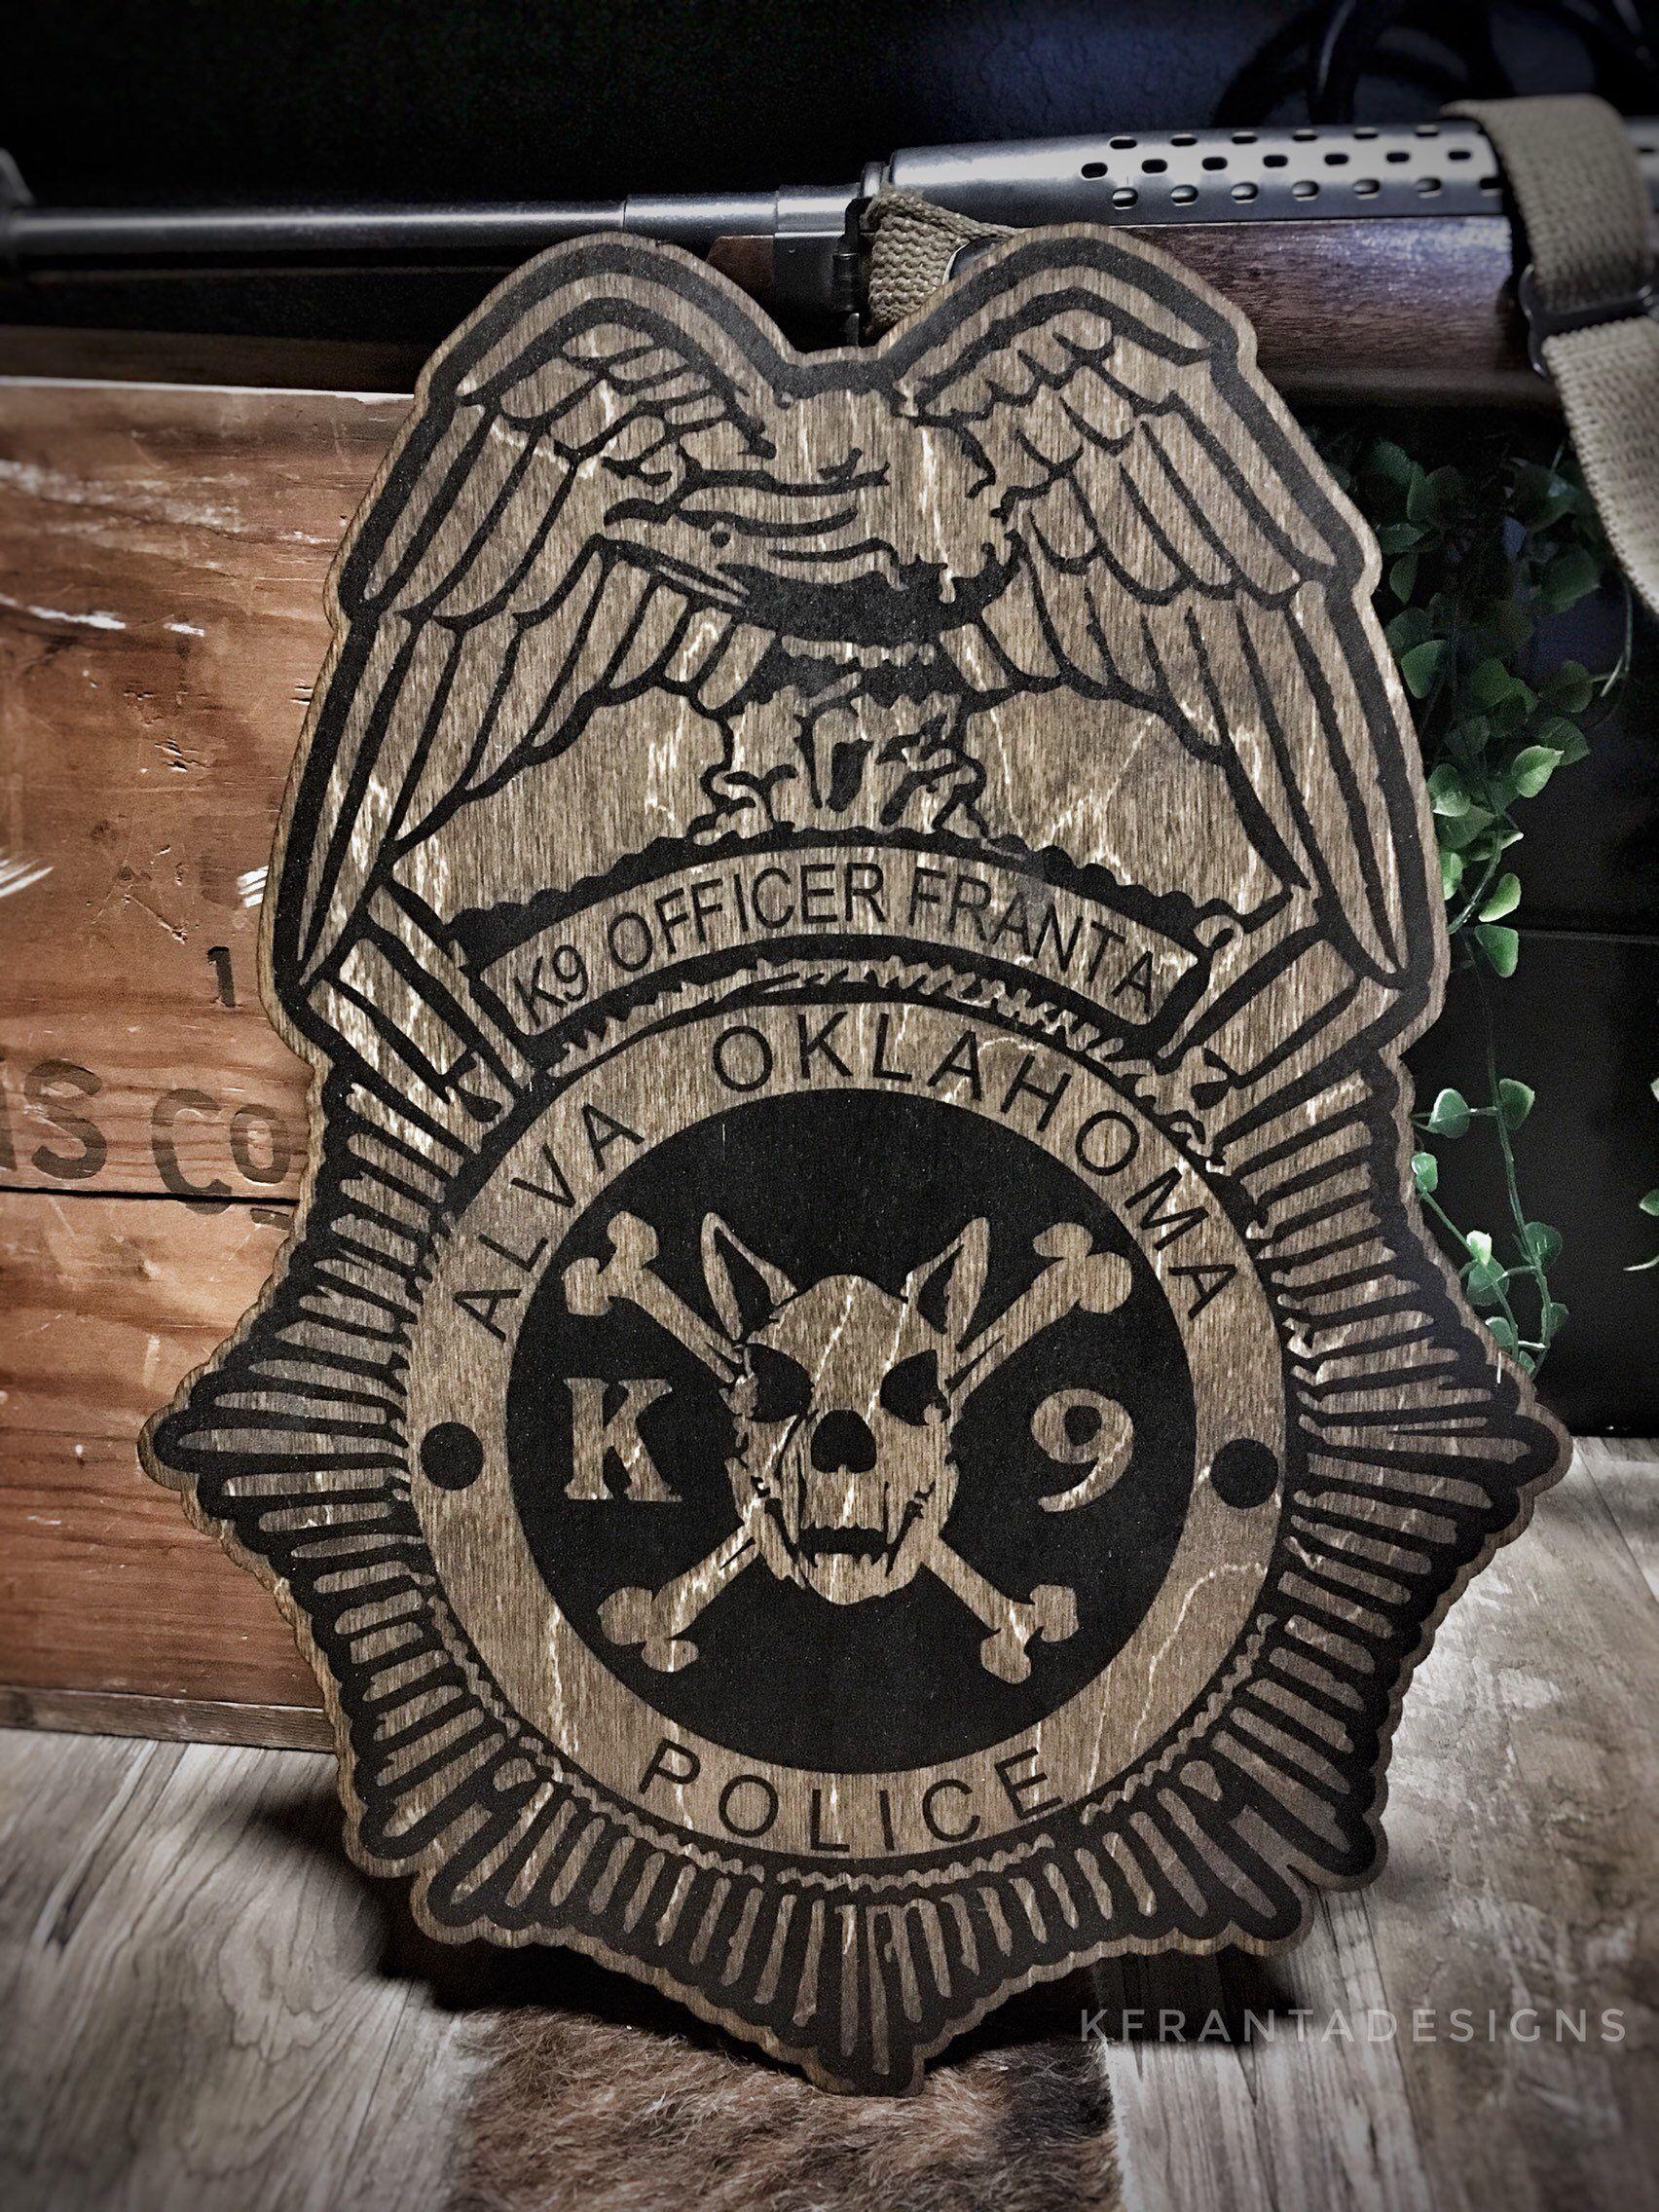 Pin on Badge Art